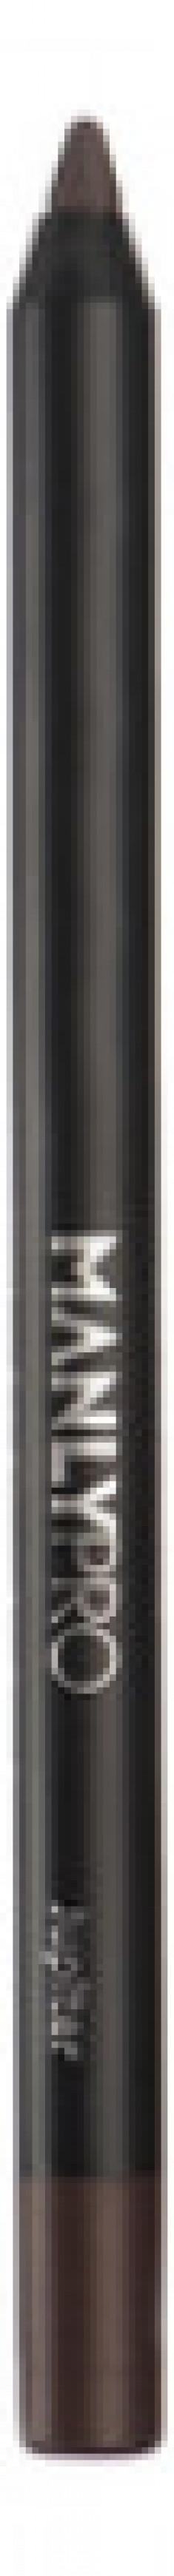 Карандаш для глаз Manly PRO E104 Юпитер \ Jupiter 6,1г